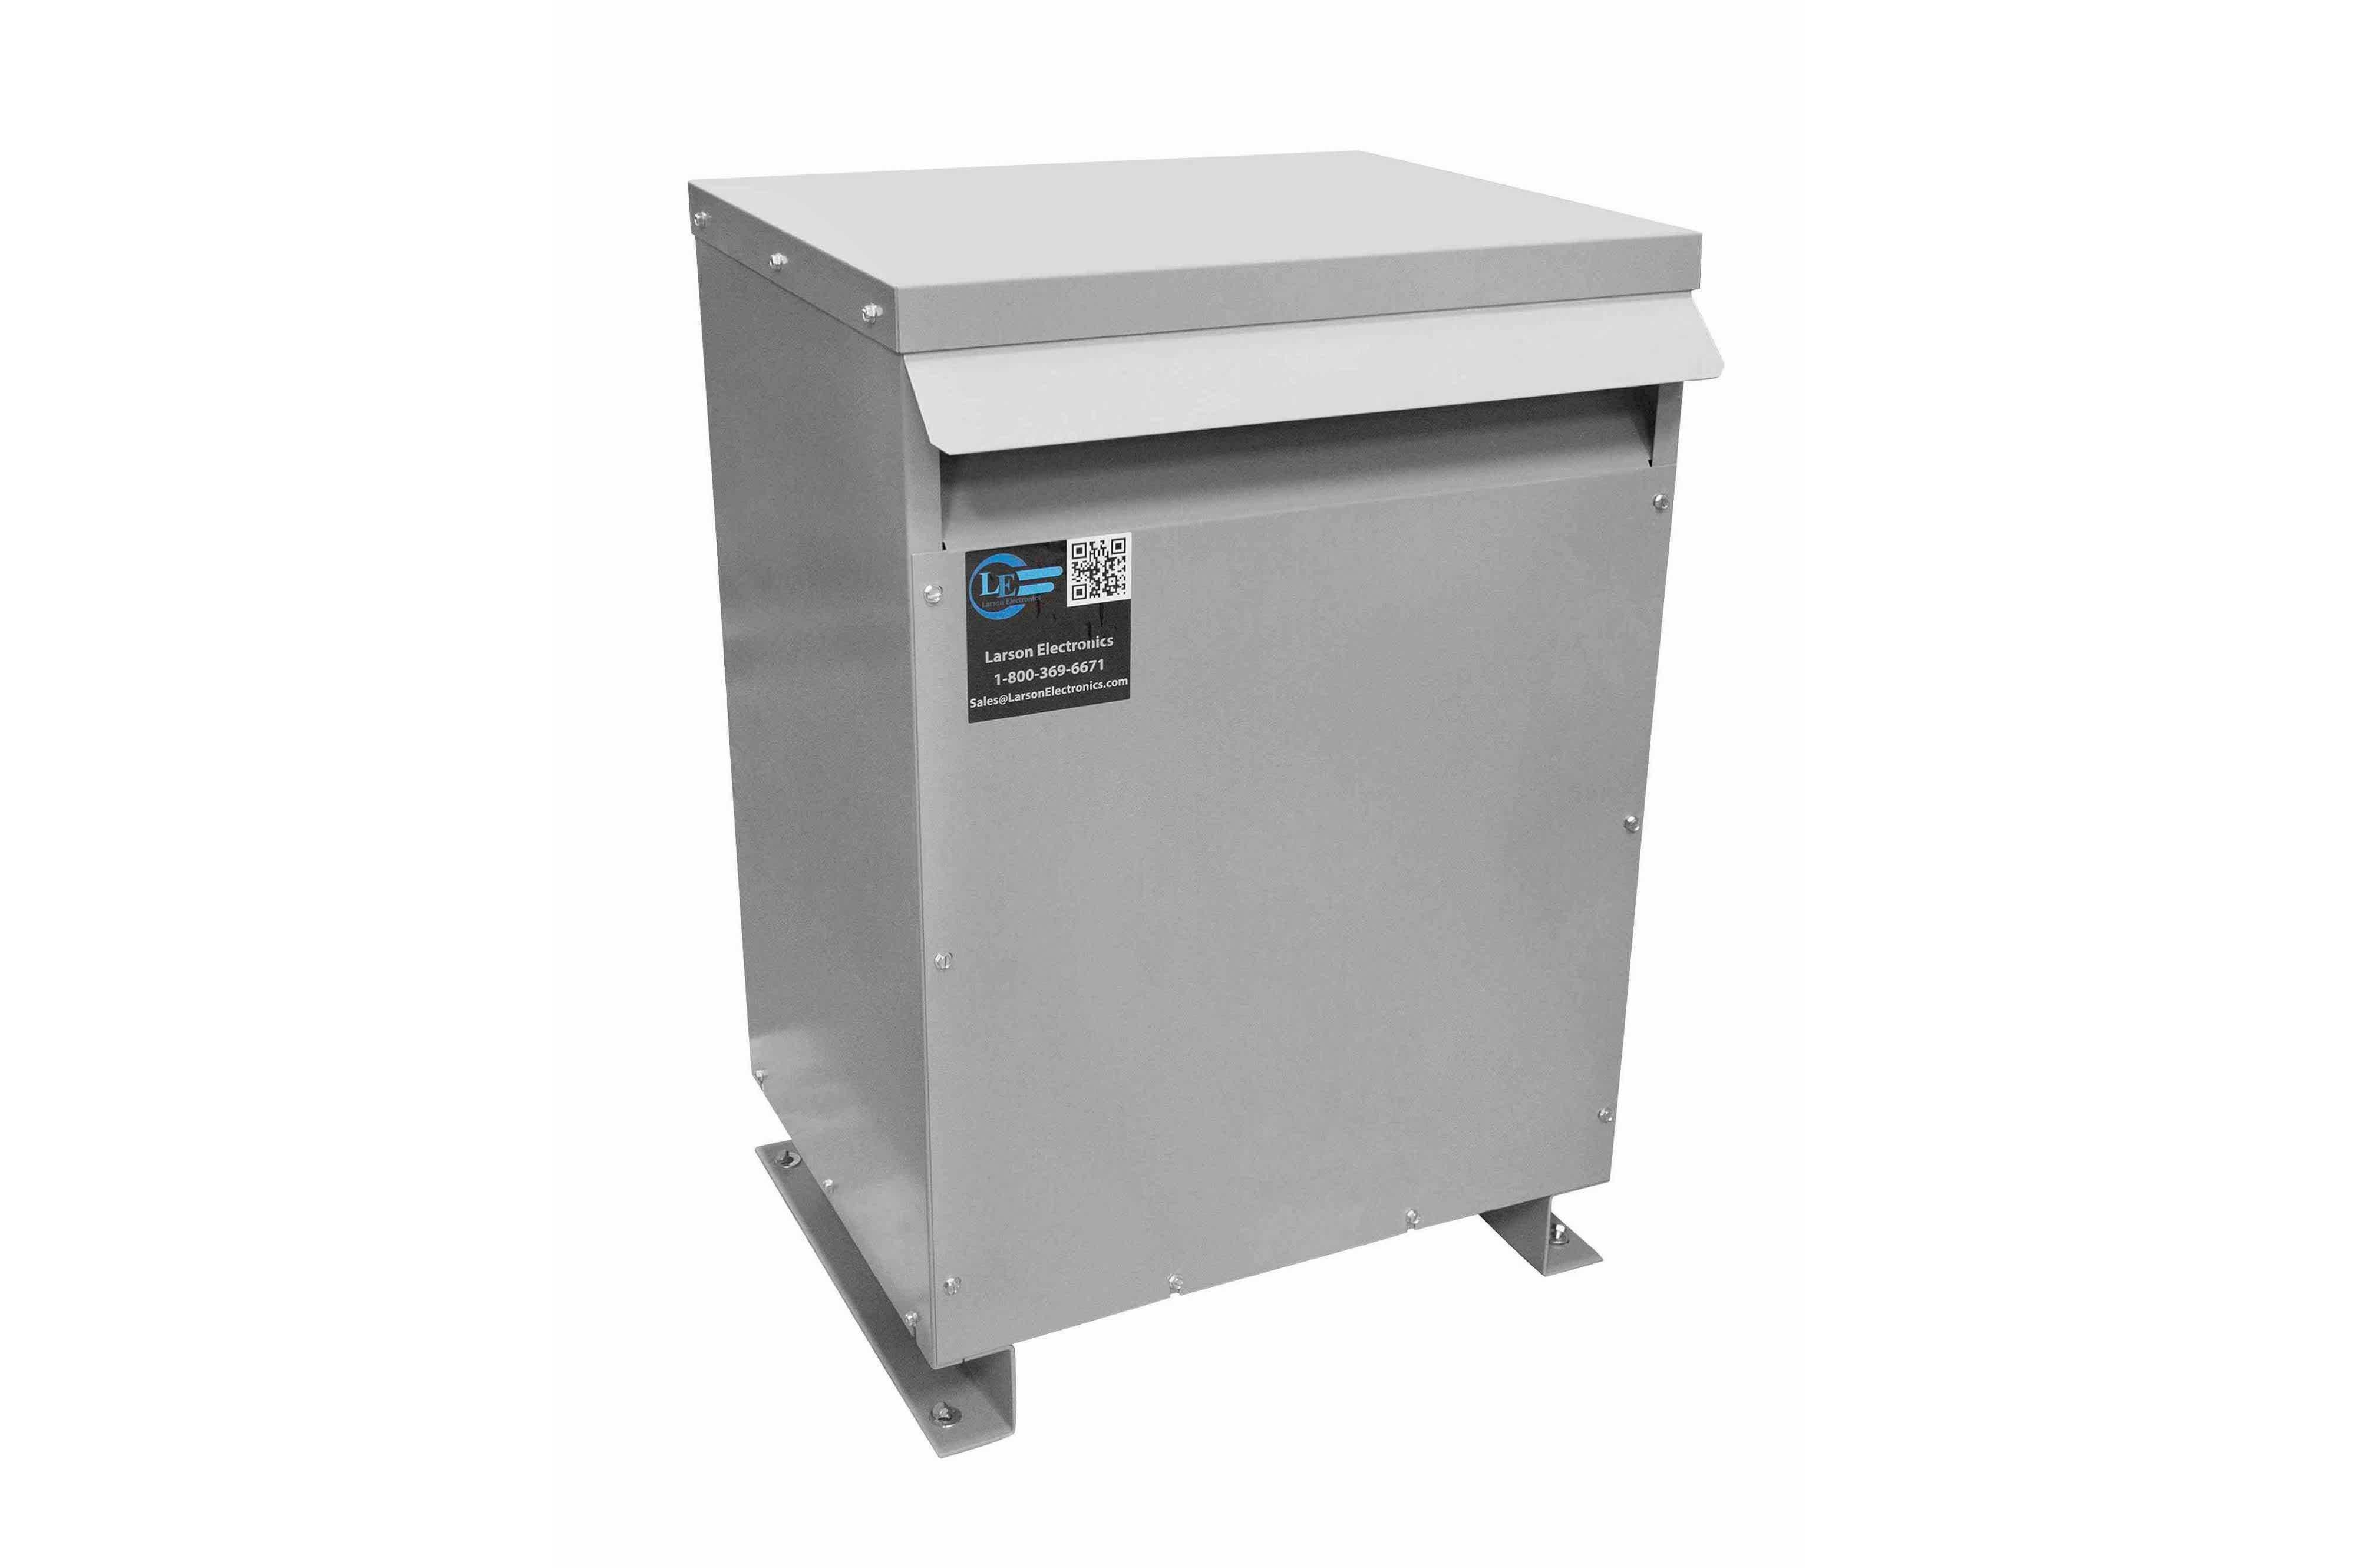 500 kVA 3PH Isolation Transformer, 600V Wye Primary, 415Y/240 Wye-N Secondary, N3R, Ventilated, 60 Hz